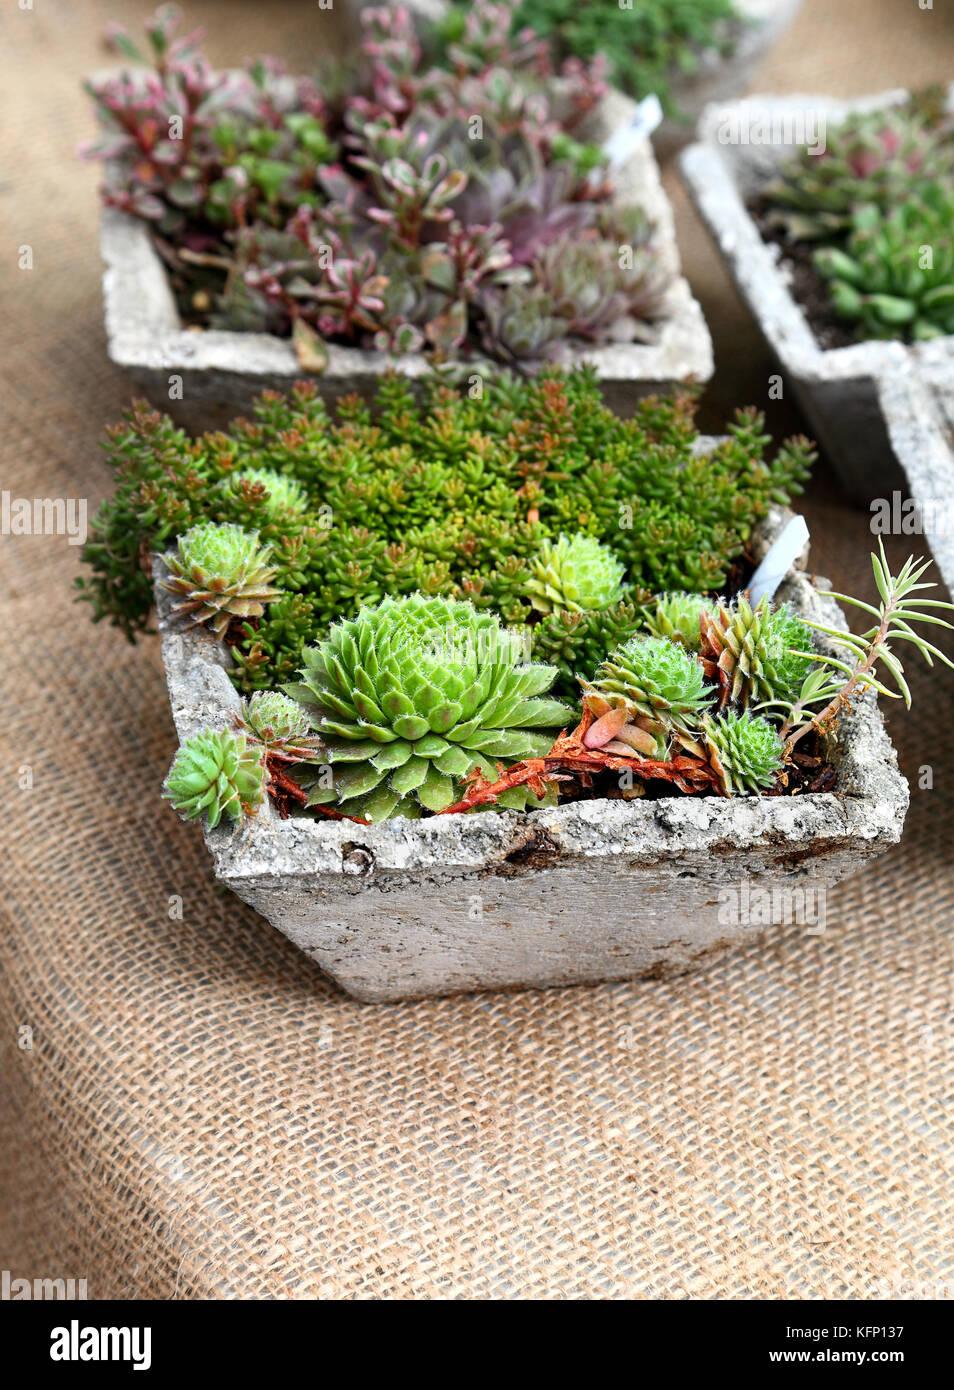 Beautiful Mini Cactus Garden Arrangements   Stock Image